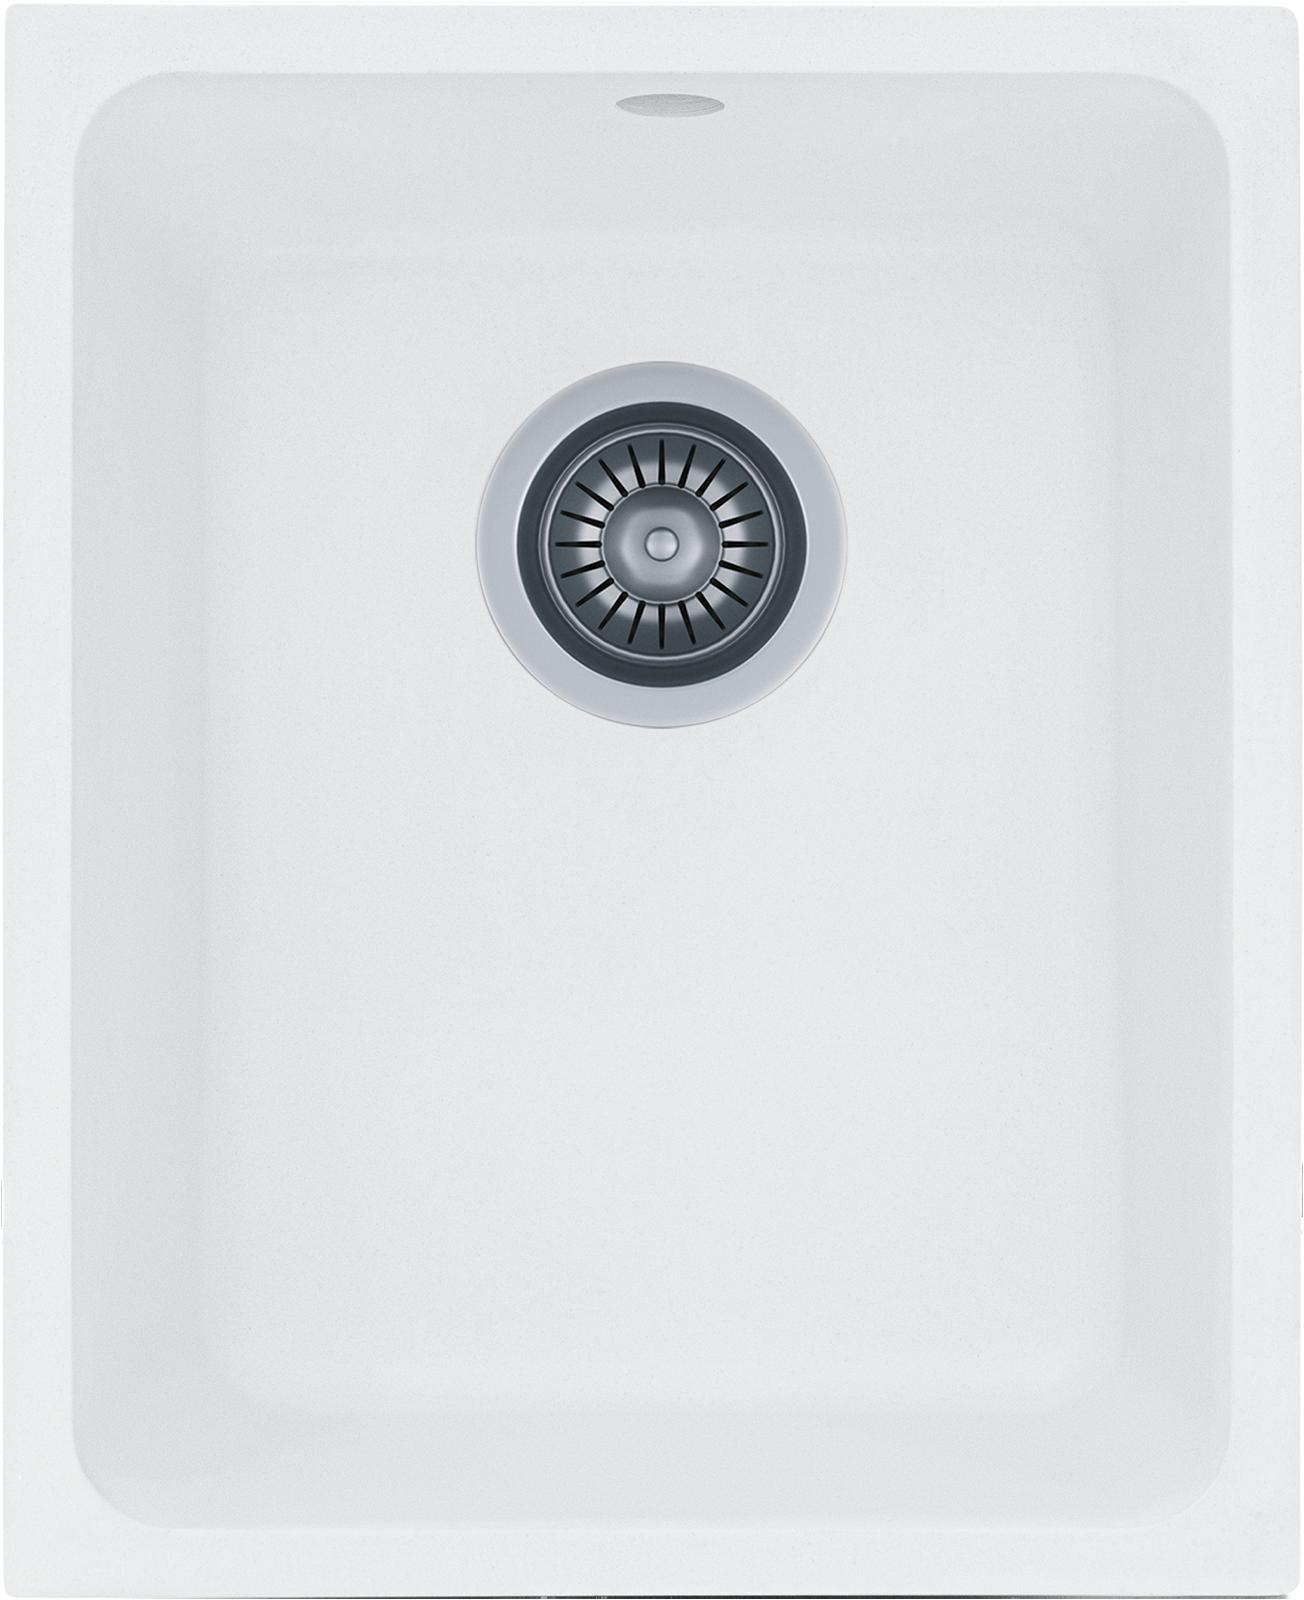 Granite Kitchen Sink Kernau Kgs U 45 1b Pure White